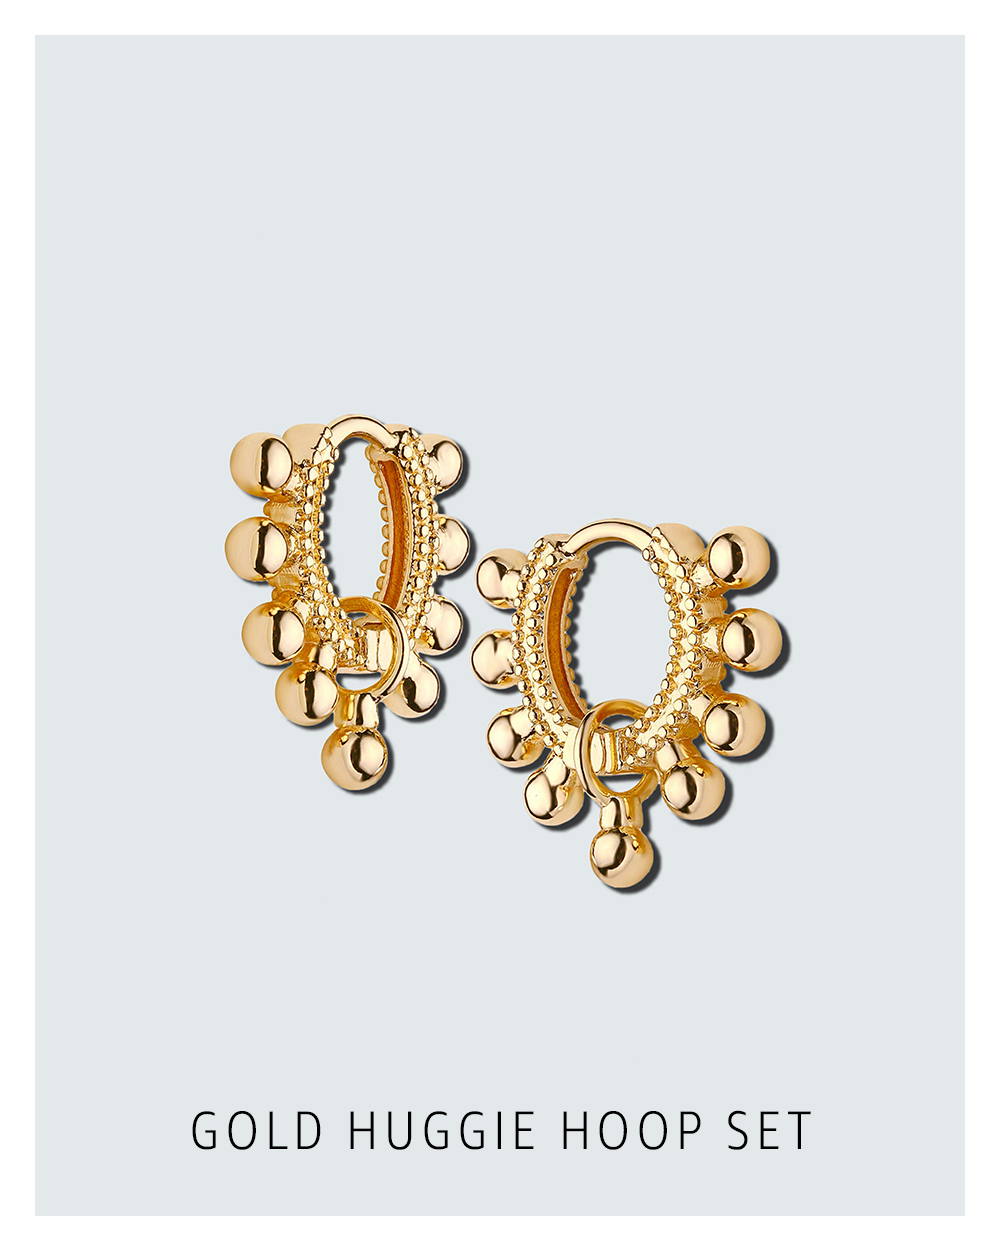 Gold huggie hoop set